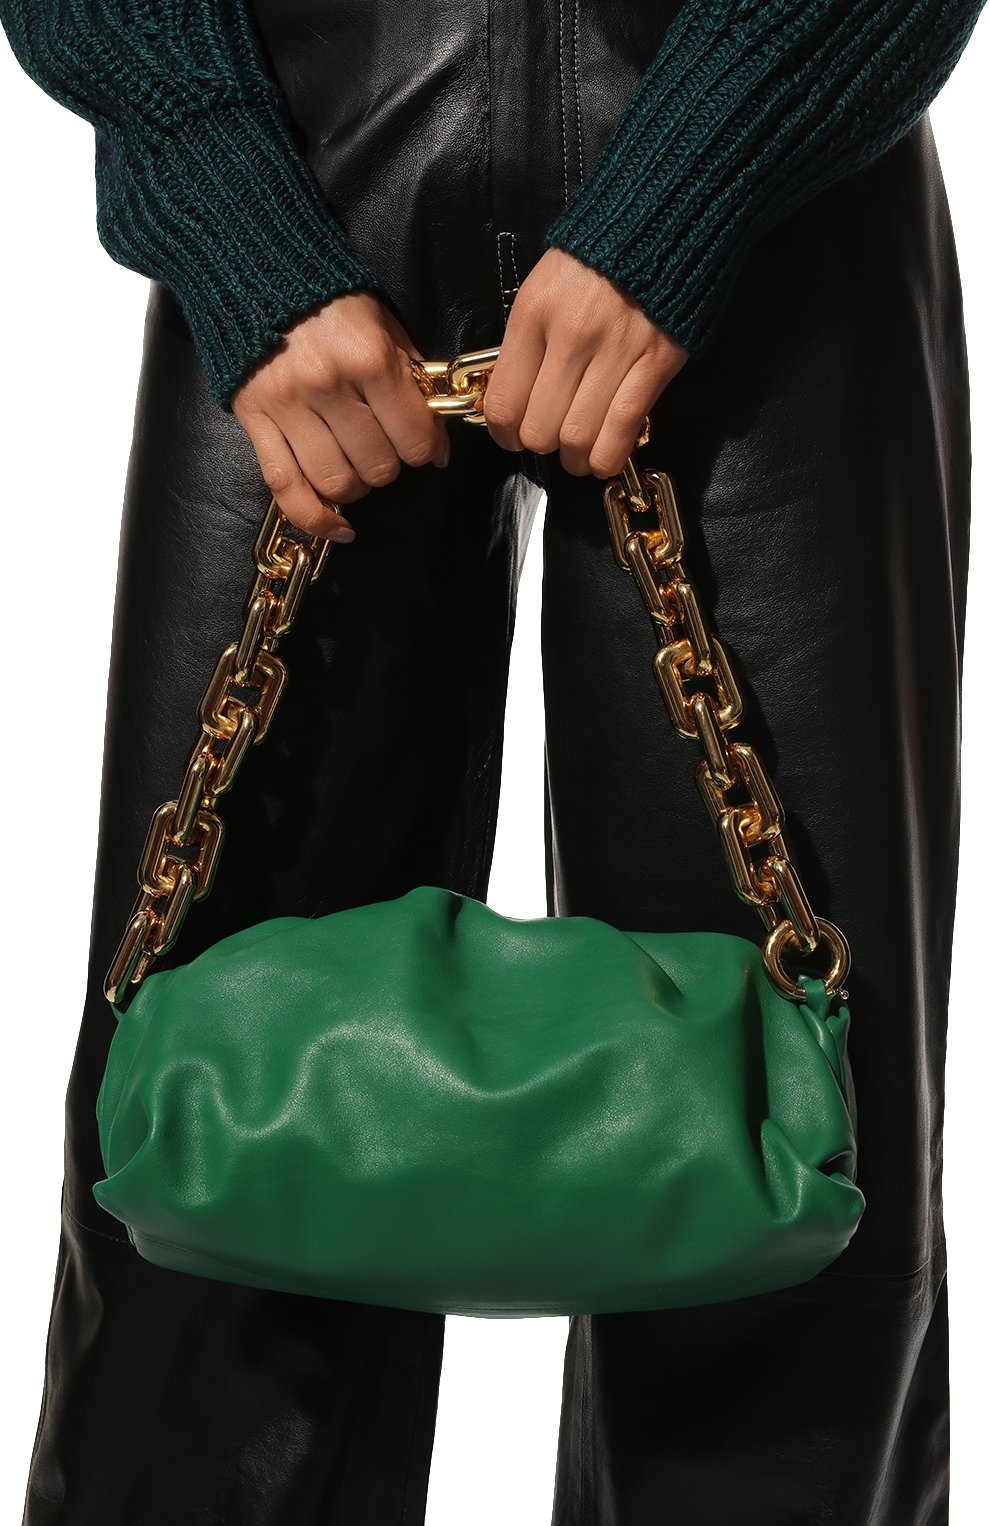 Женская сумка chain pouch BOTTEGA VENETA зеленого цвета, арт. 620230/VCP40   Фото 6